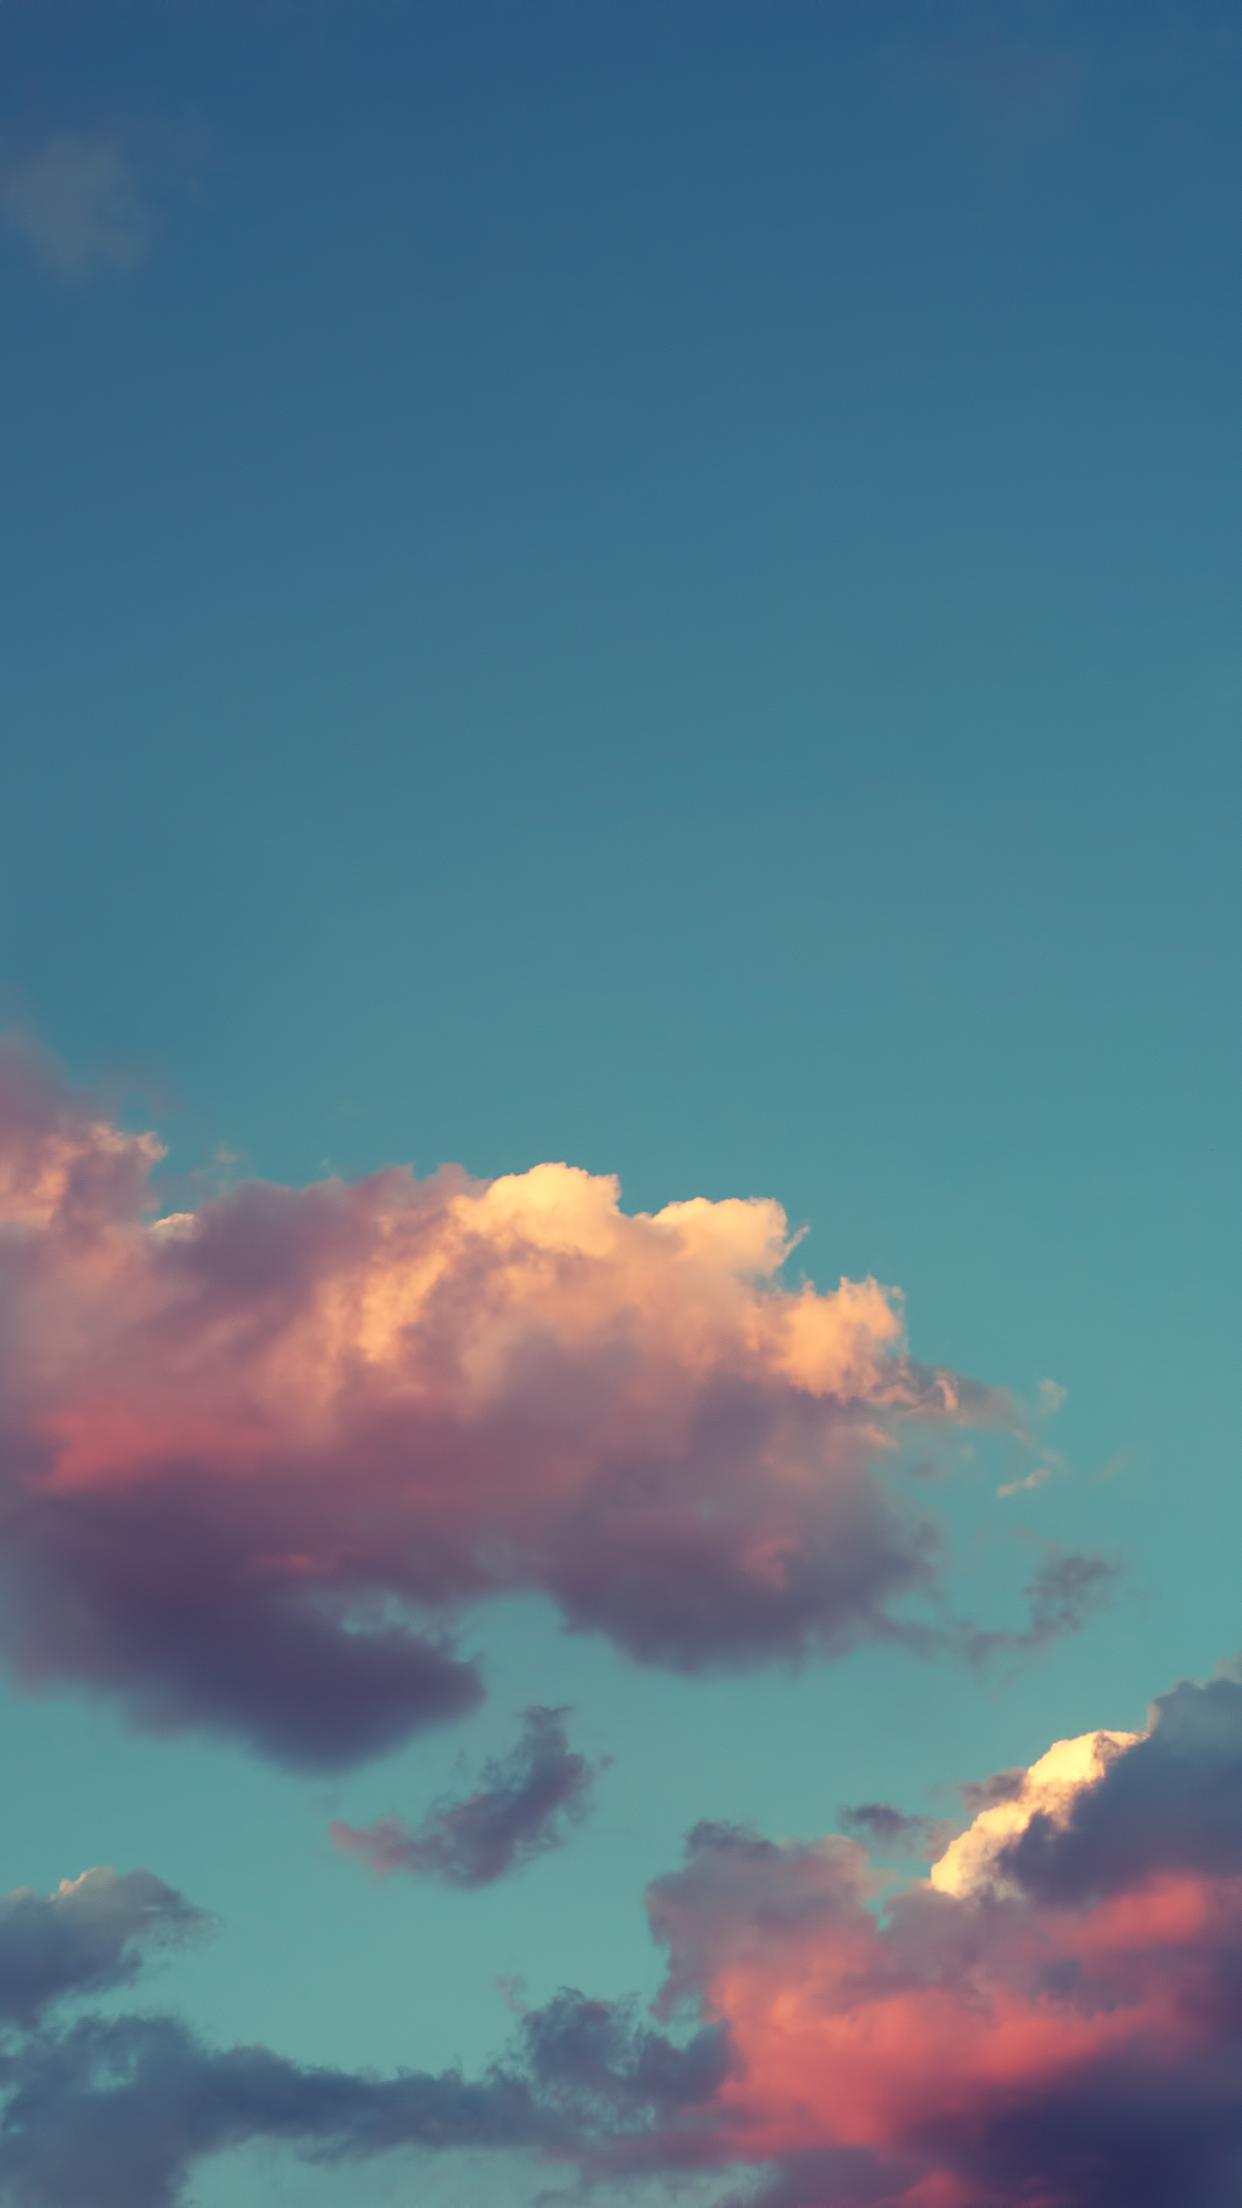 Solefield iPhone 6 sunsetclouds1plus Sunset Clouds